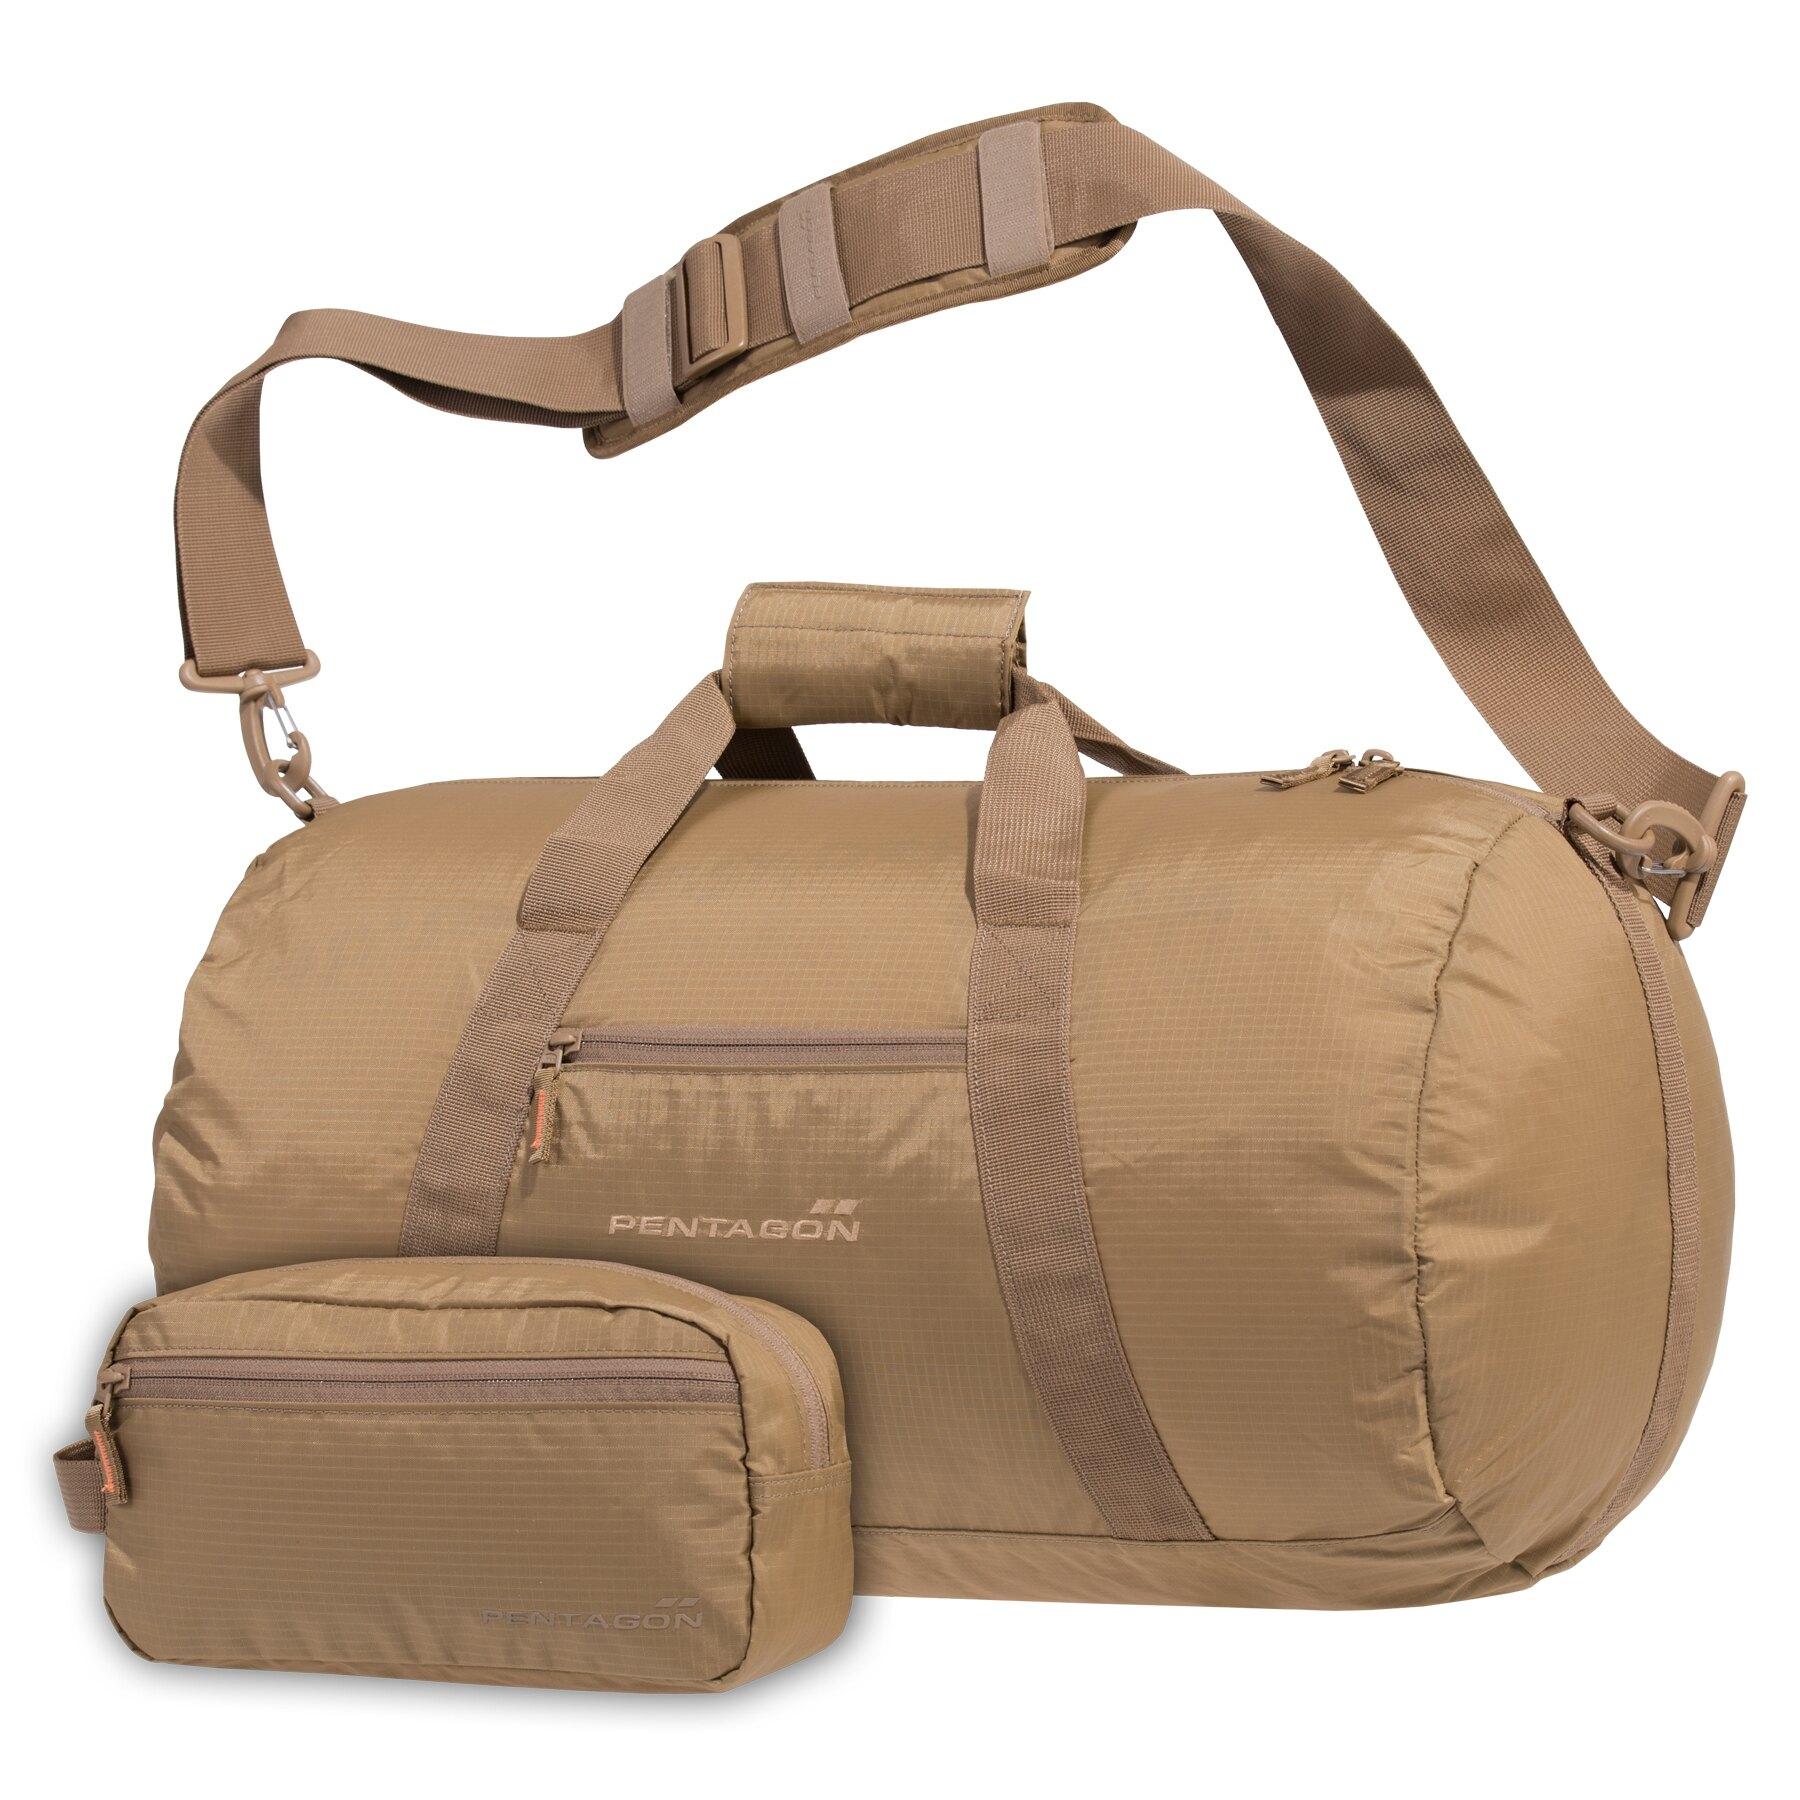 Športová taška PENTAGON® Kanon - coyote (Farba: Coyote)